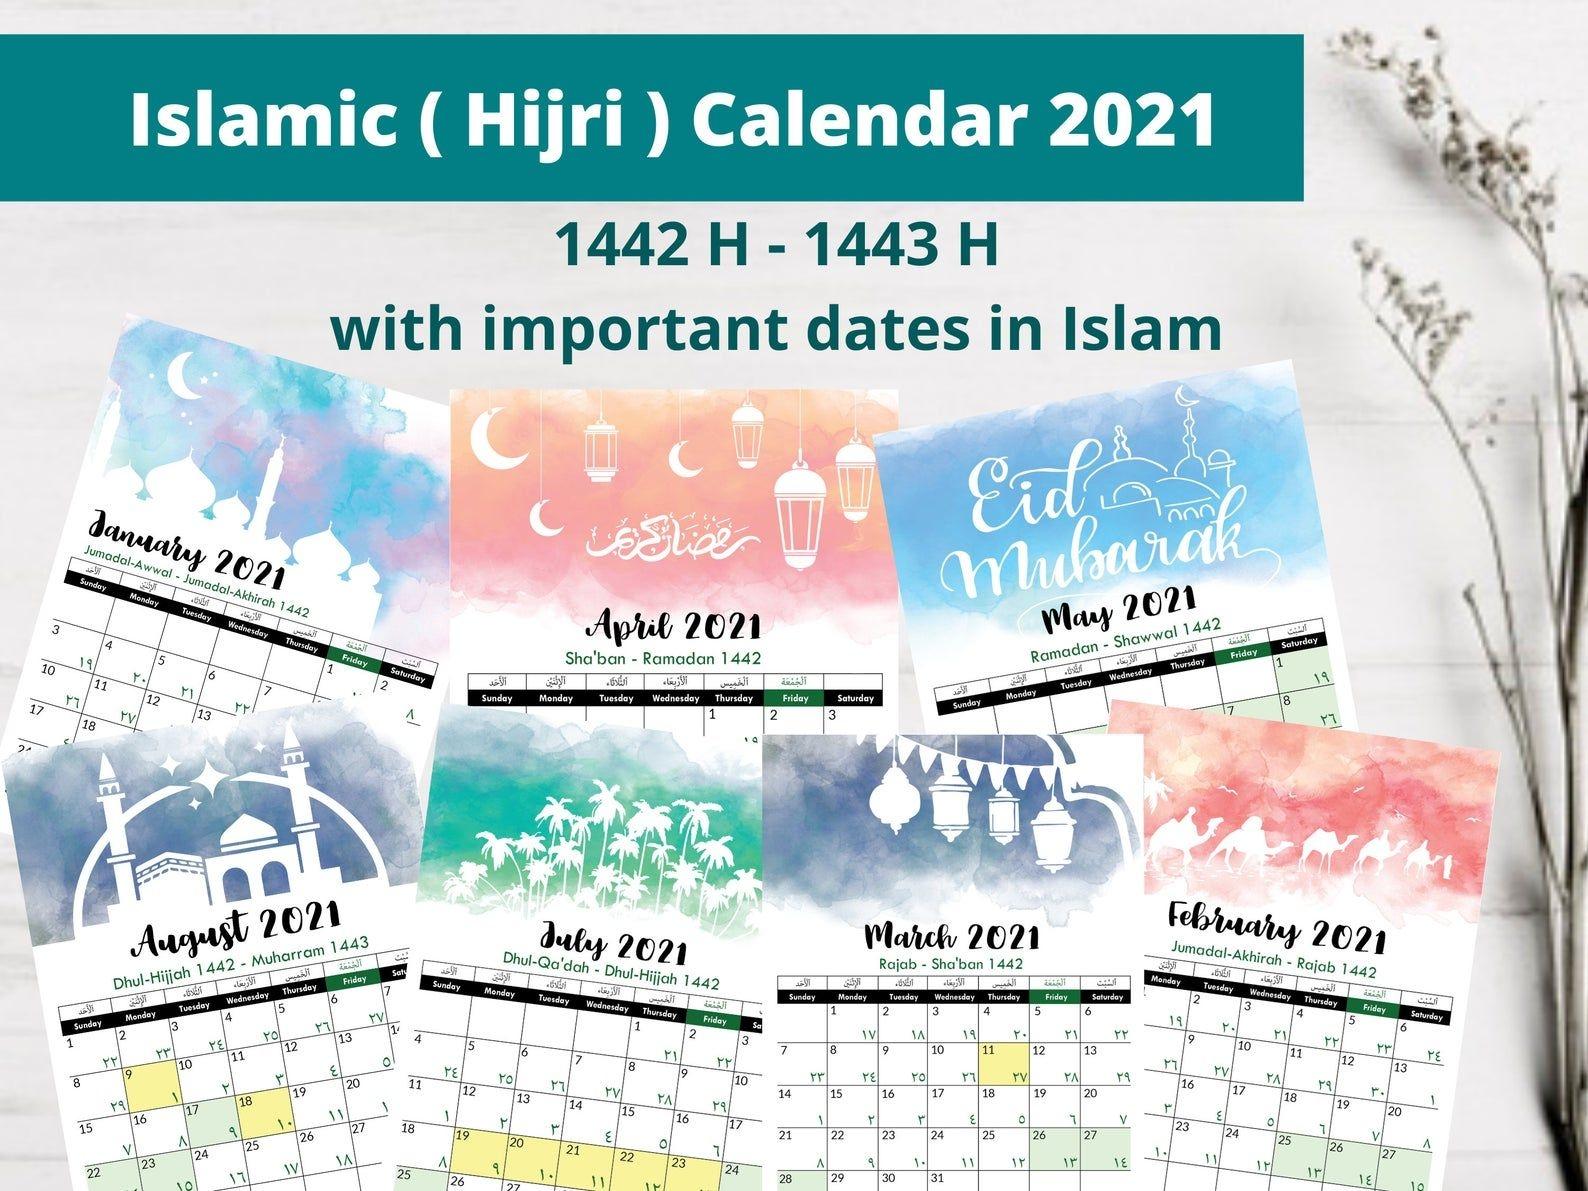 Islamic Hijri Calendar 2021 1442 H 1443 H | Etsy